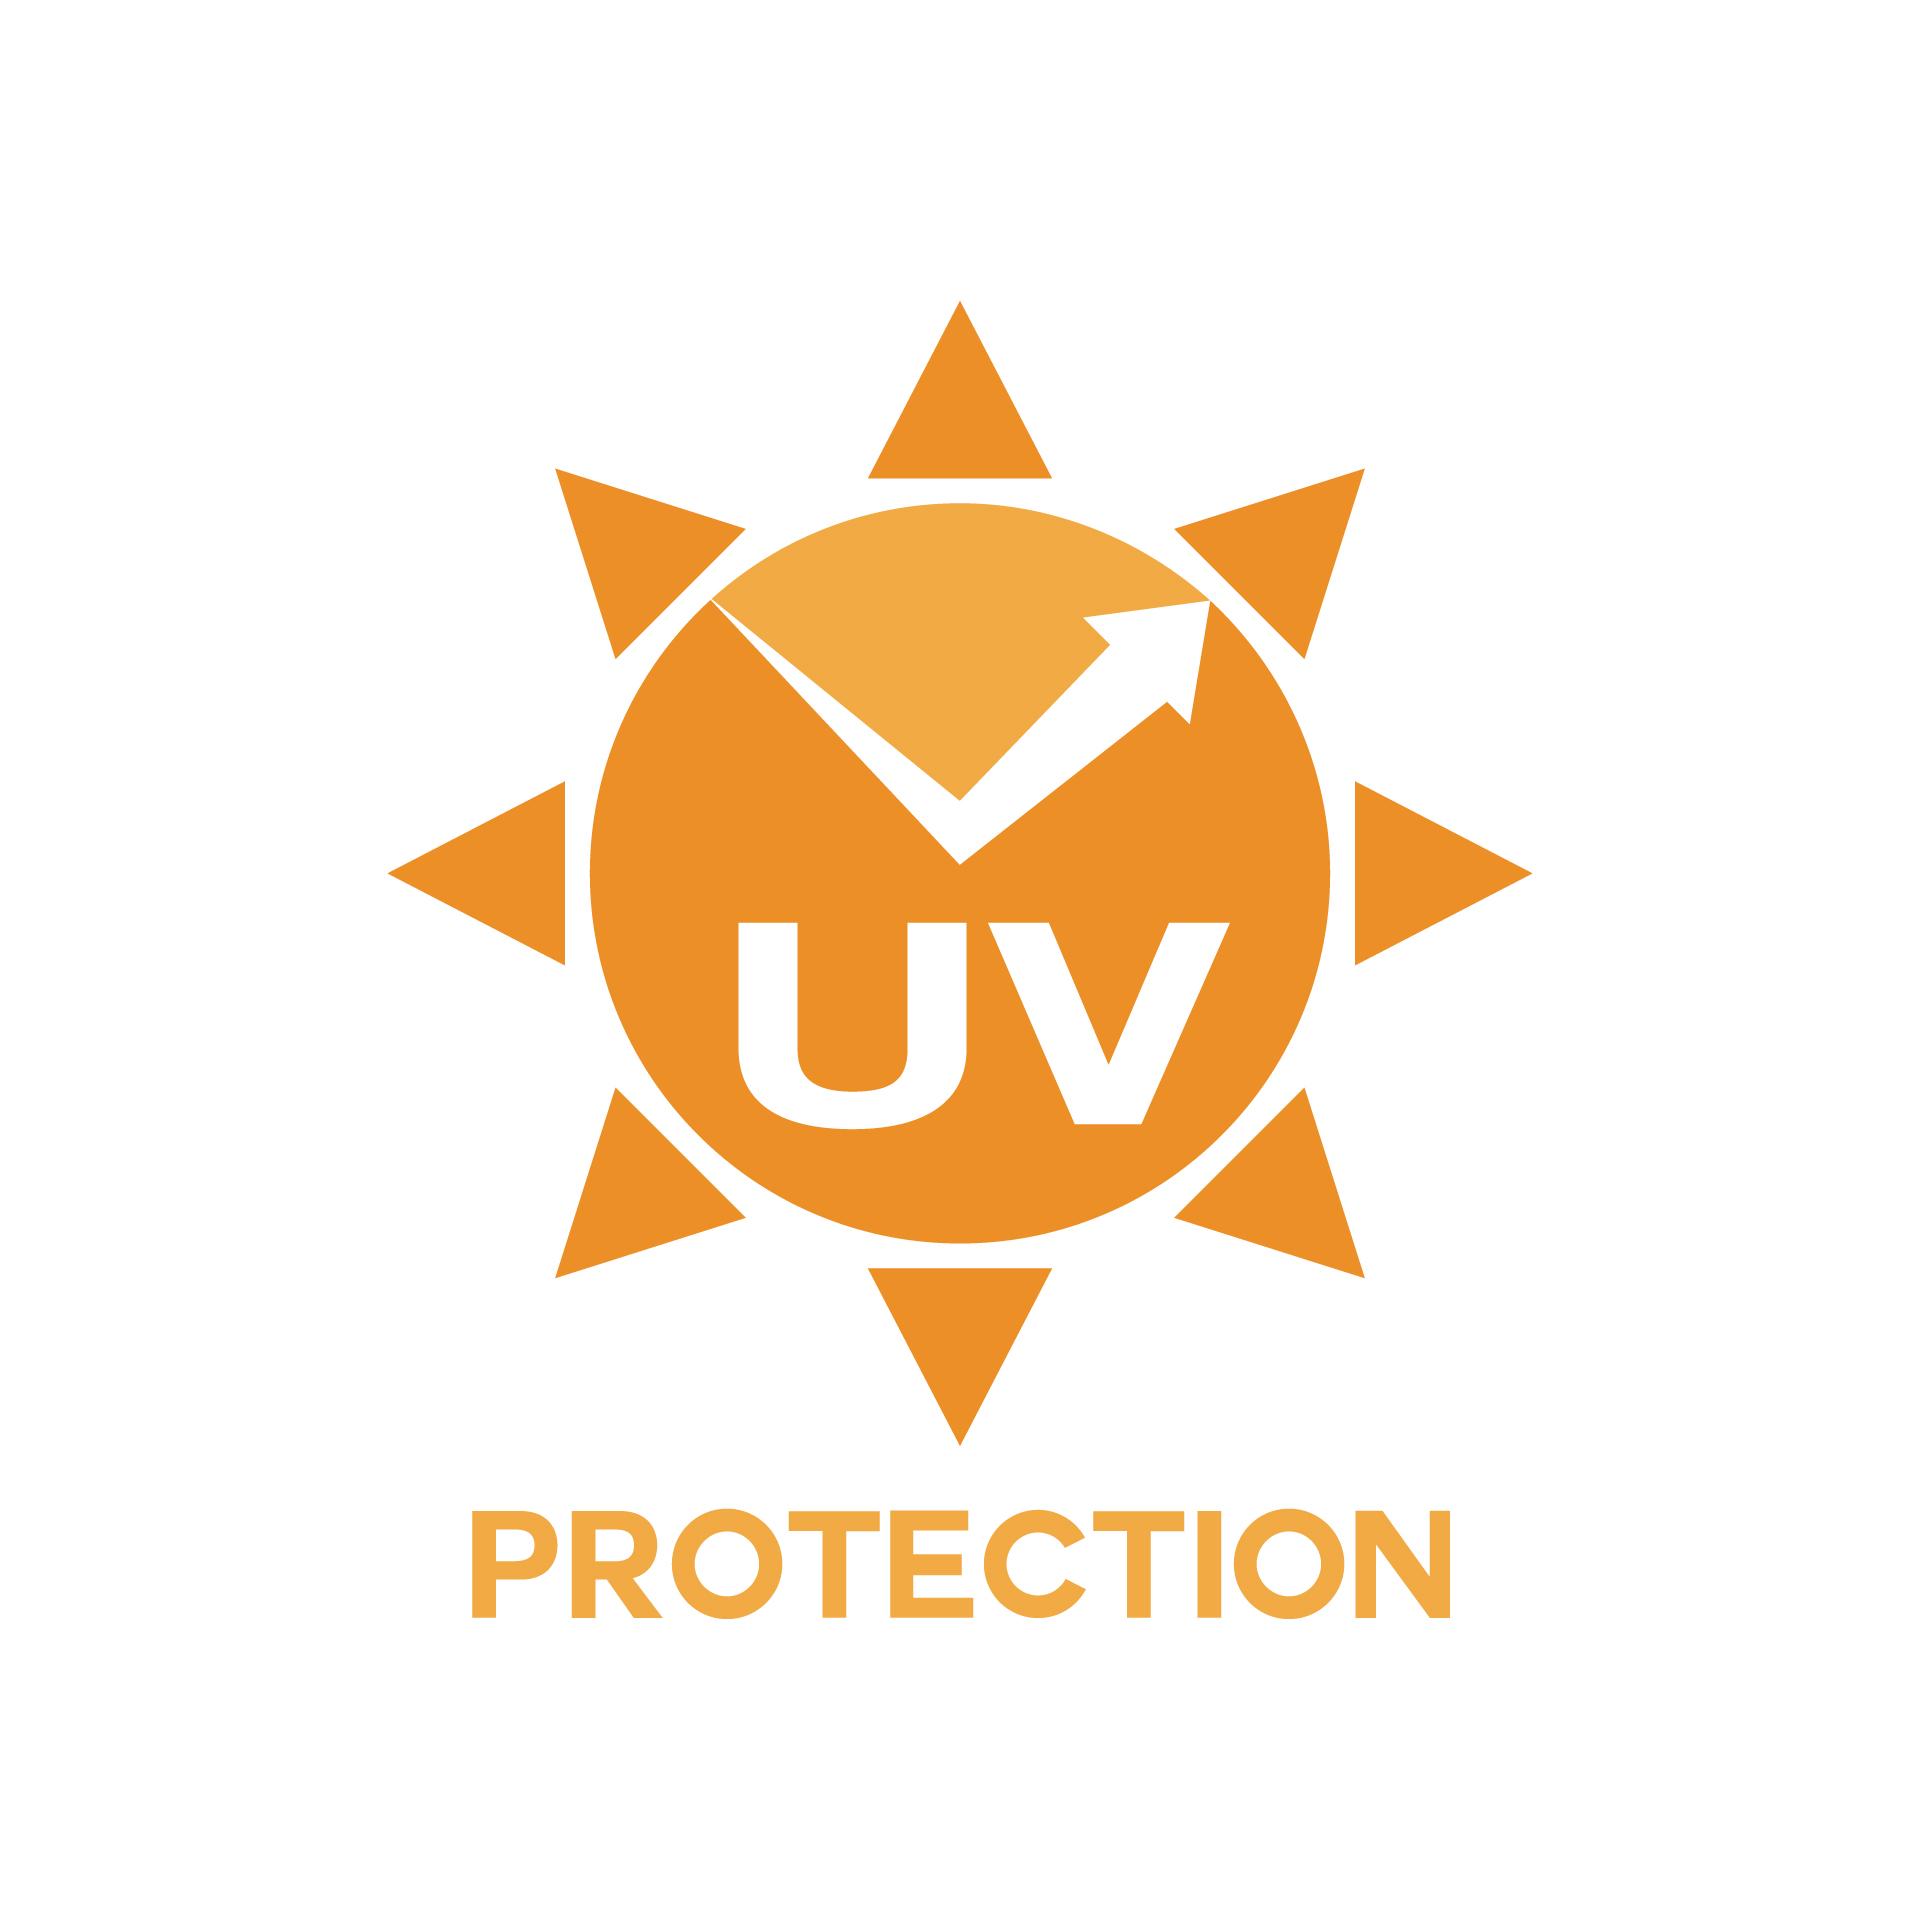 UV-PROTECTION